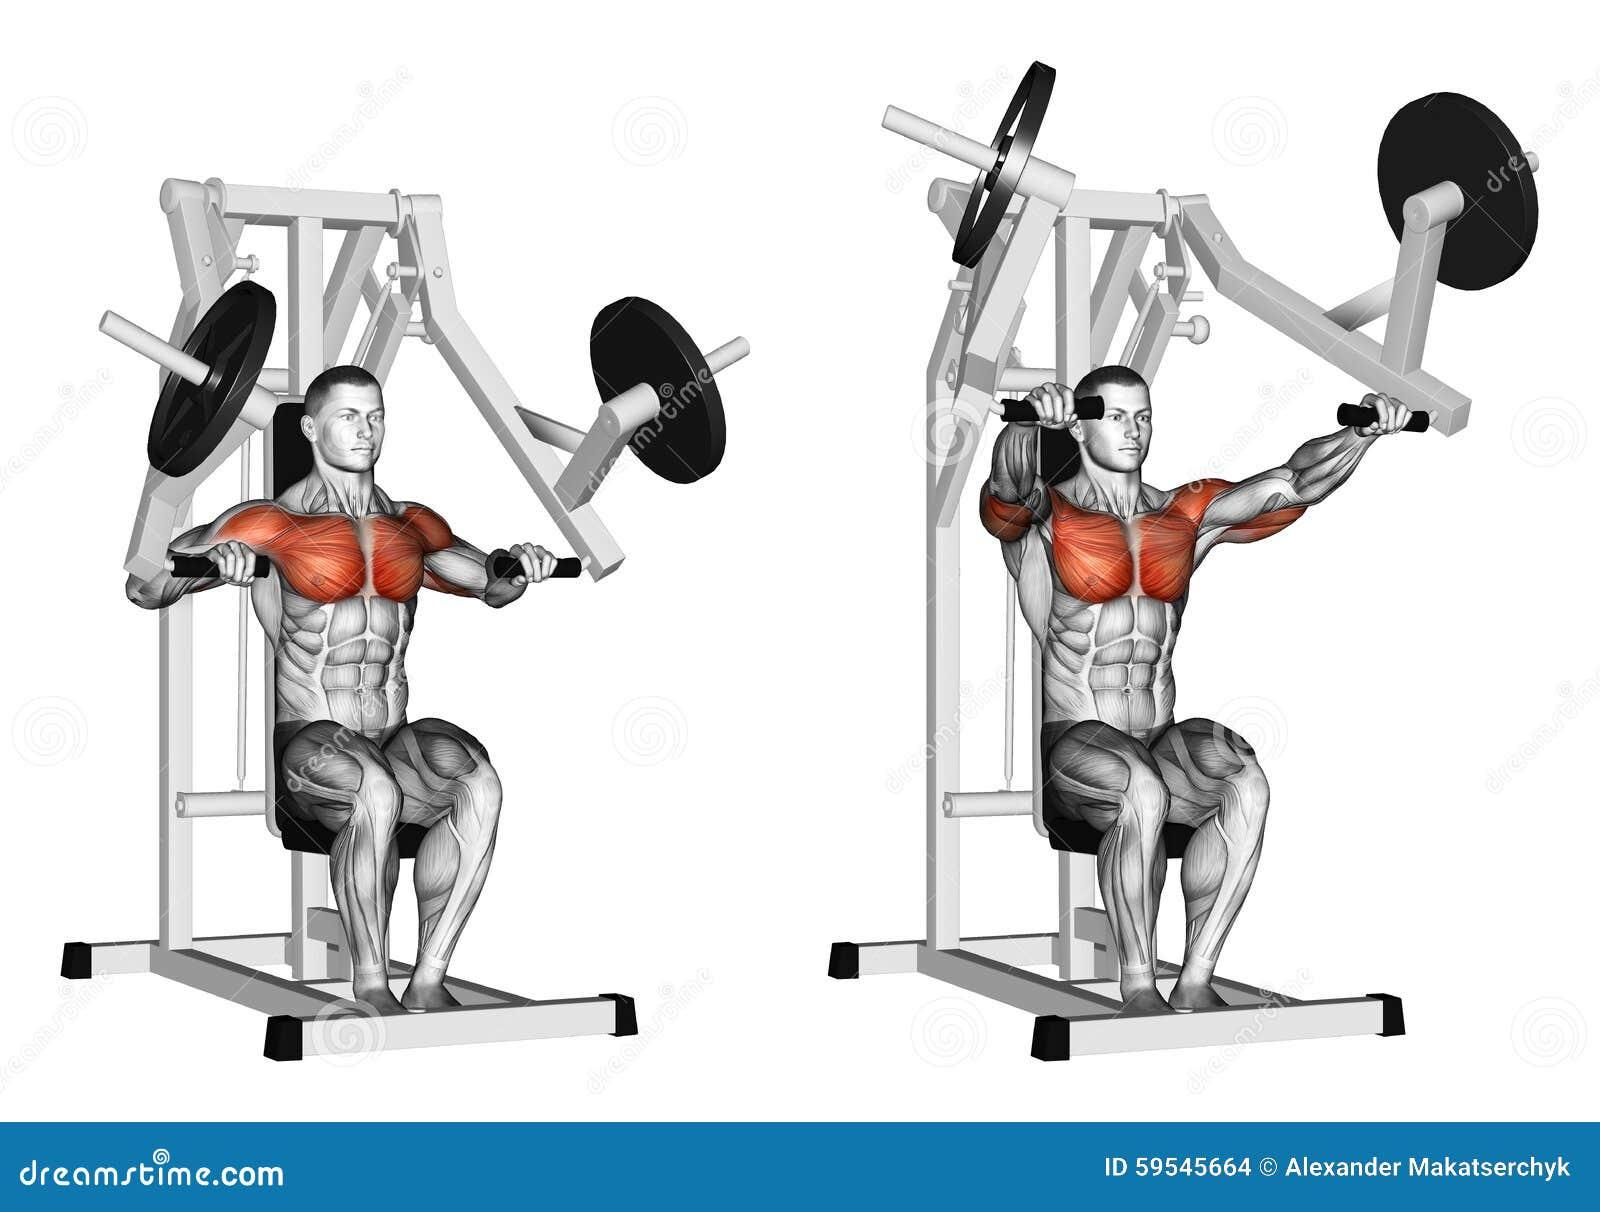 Exercising. Press Hammer Strength Gym Simulator Stock ...